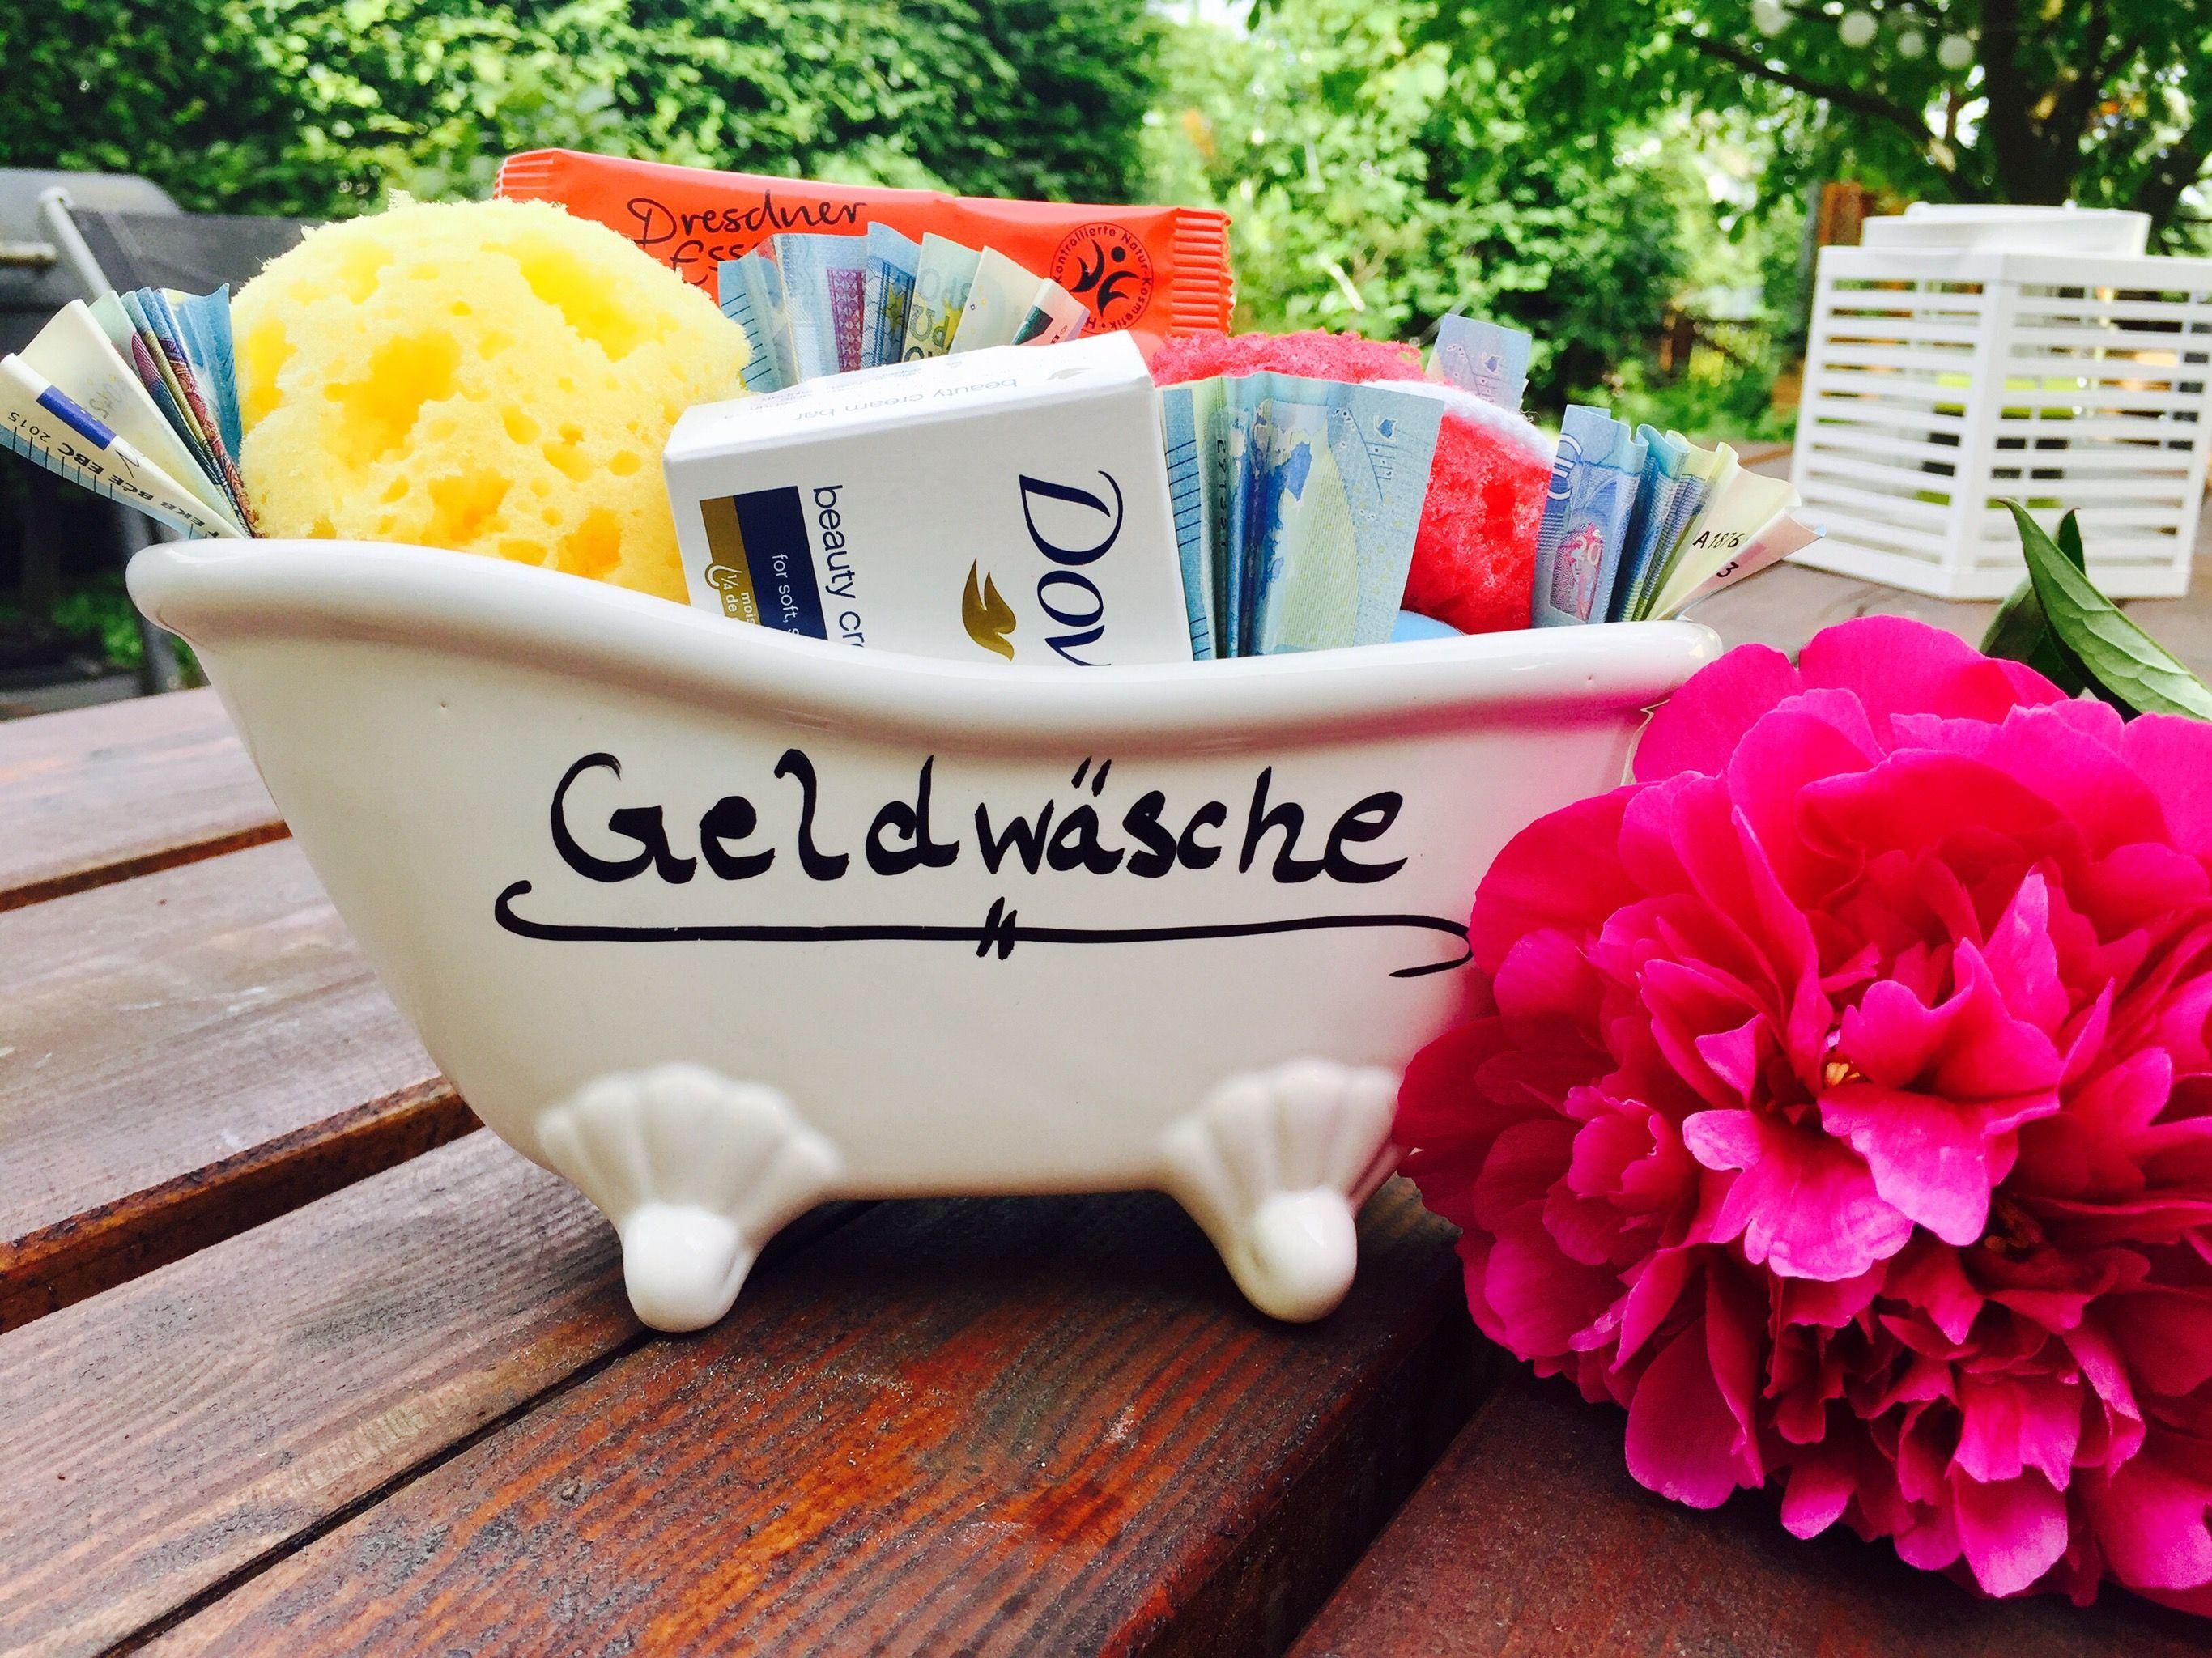 Geldgeschenk Mal Anders Geldwasche Geldgeschenke Geschenke